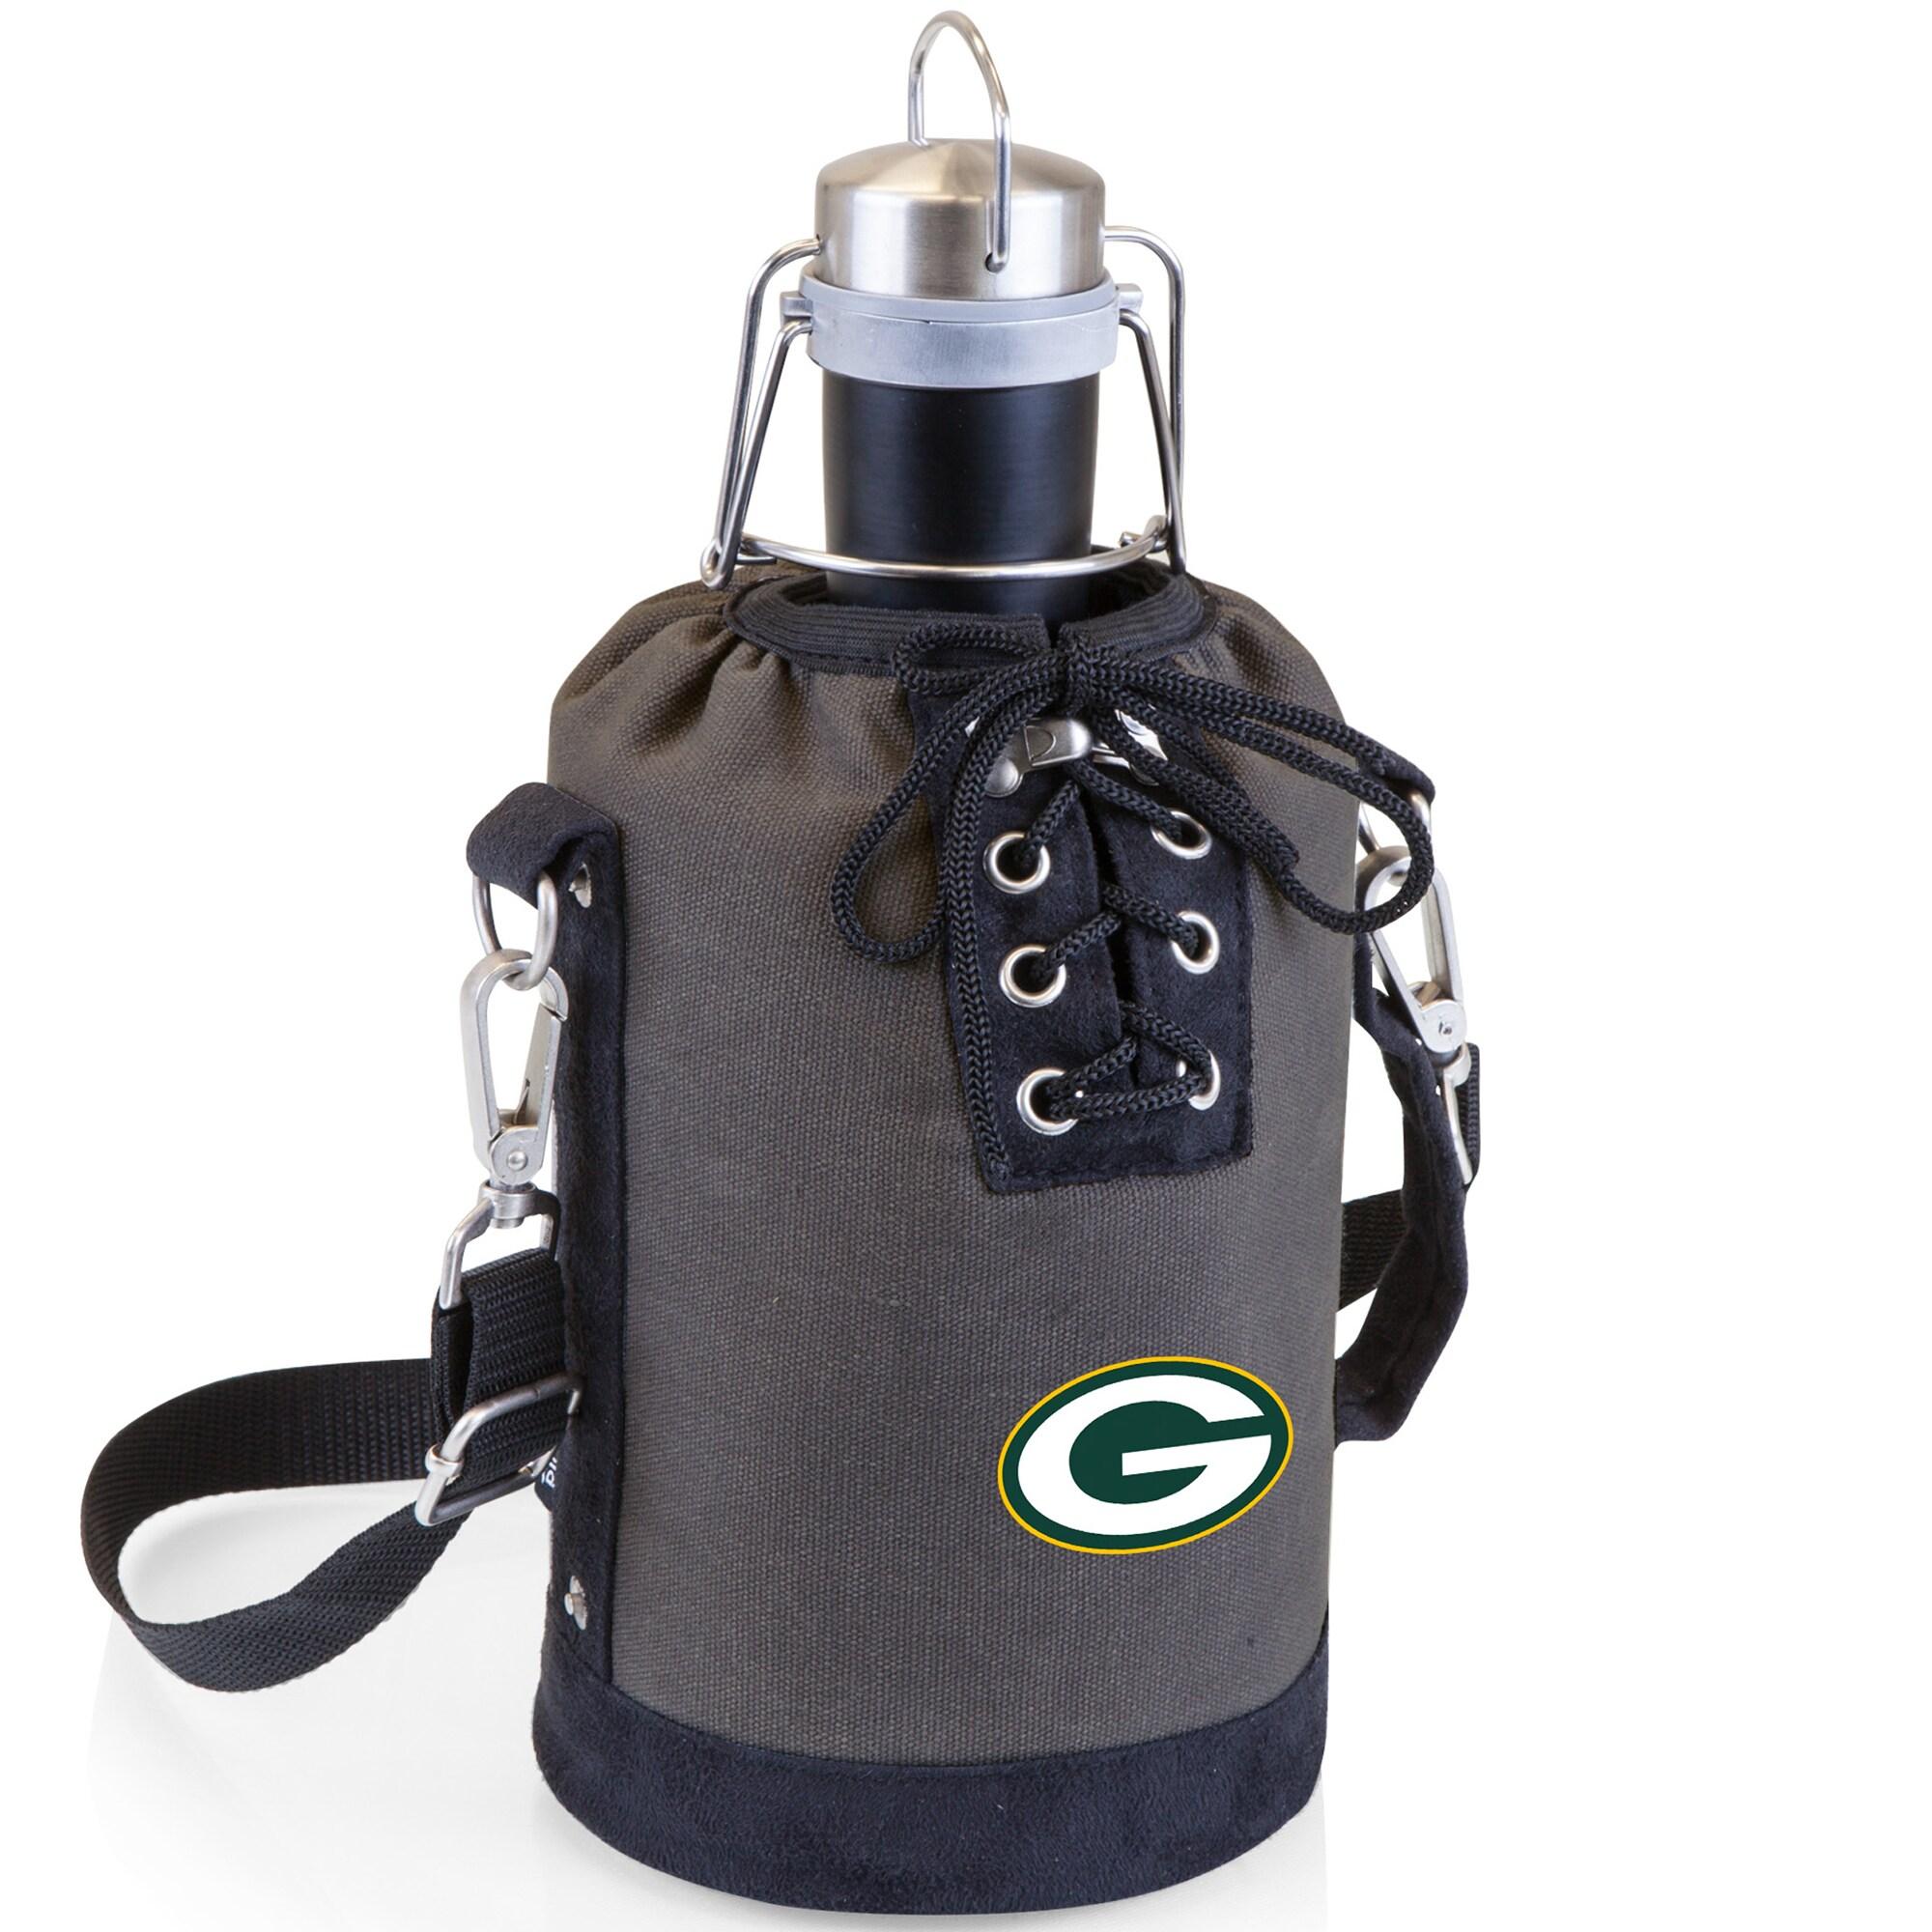 Green Bay Packers Growler Tote Set